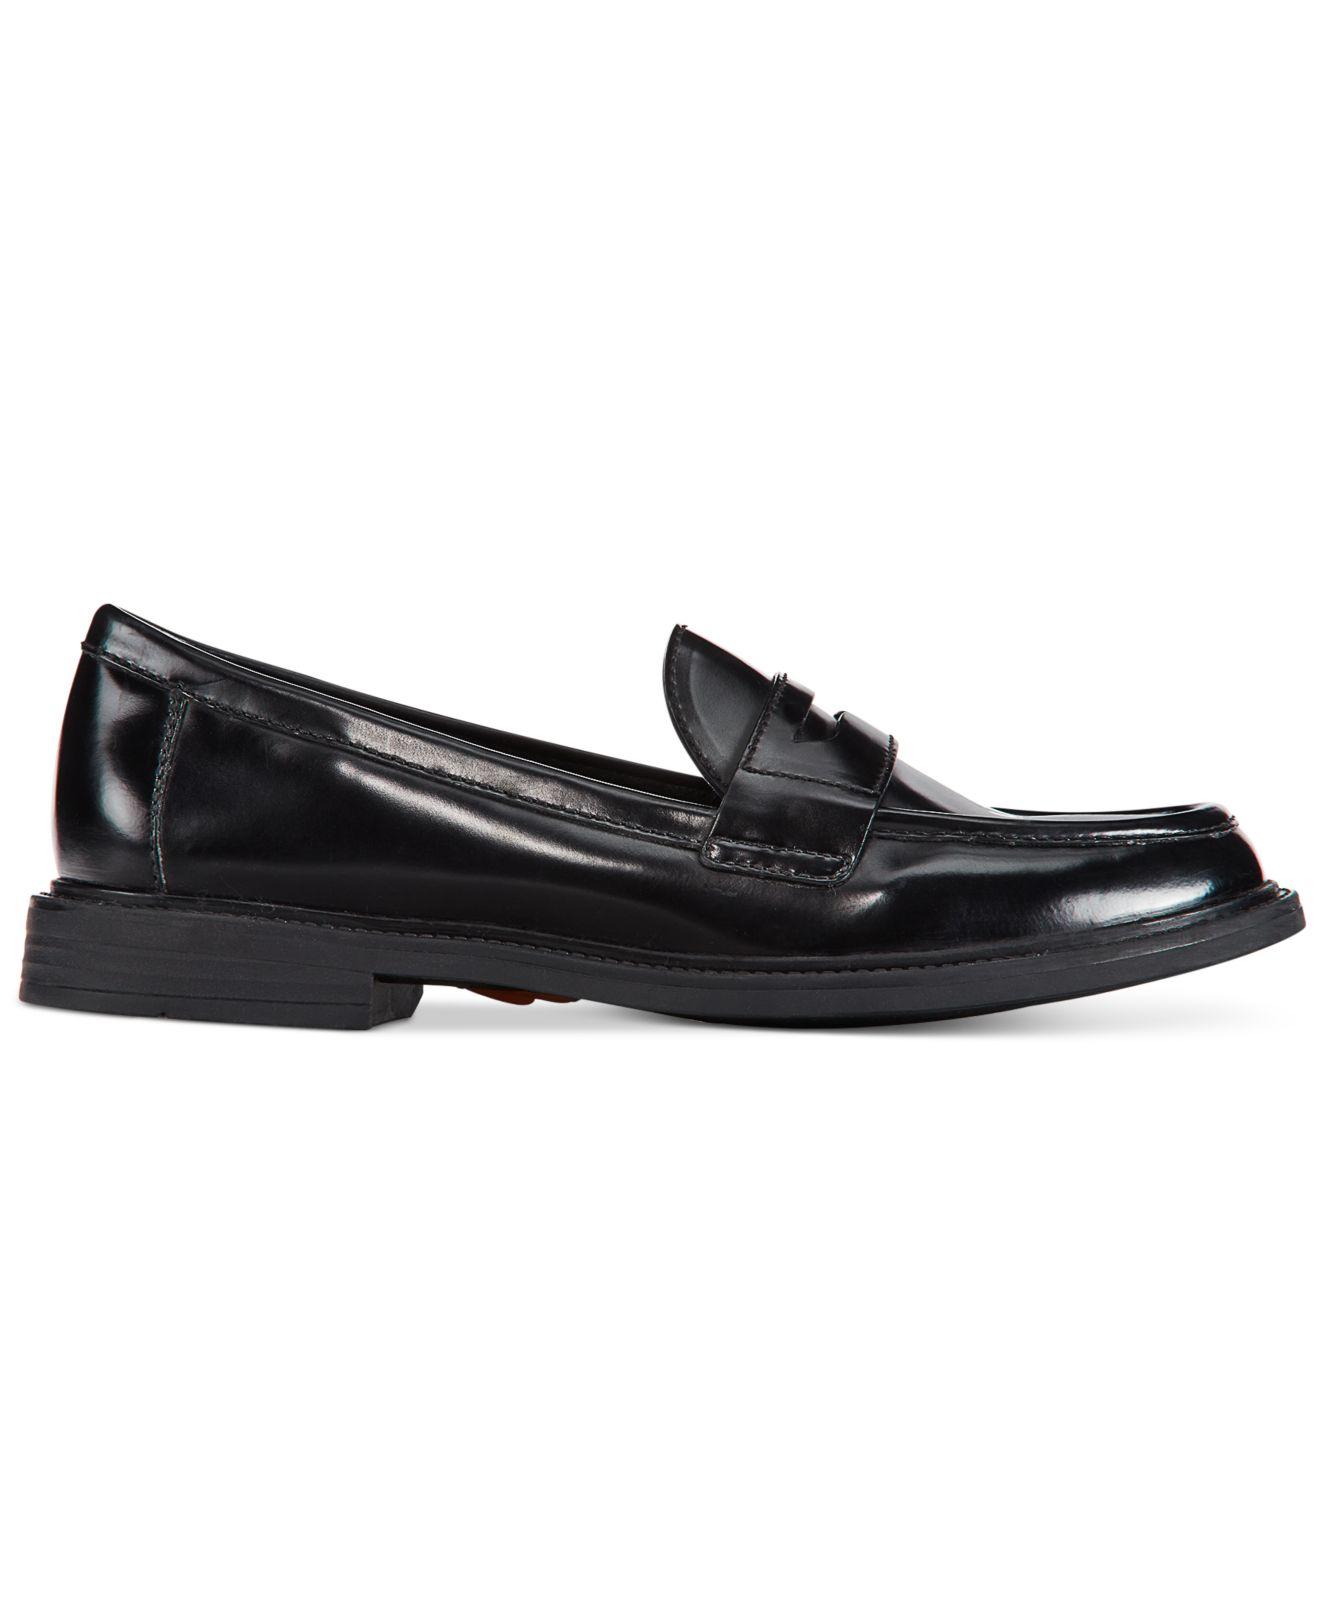 a13257319cc Cole Haan Pinch Campus Black Women Slip On Shoes